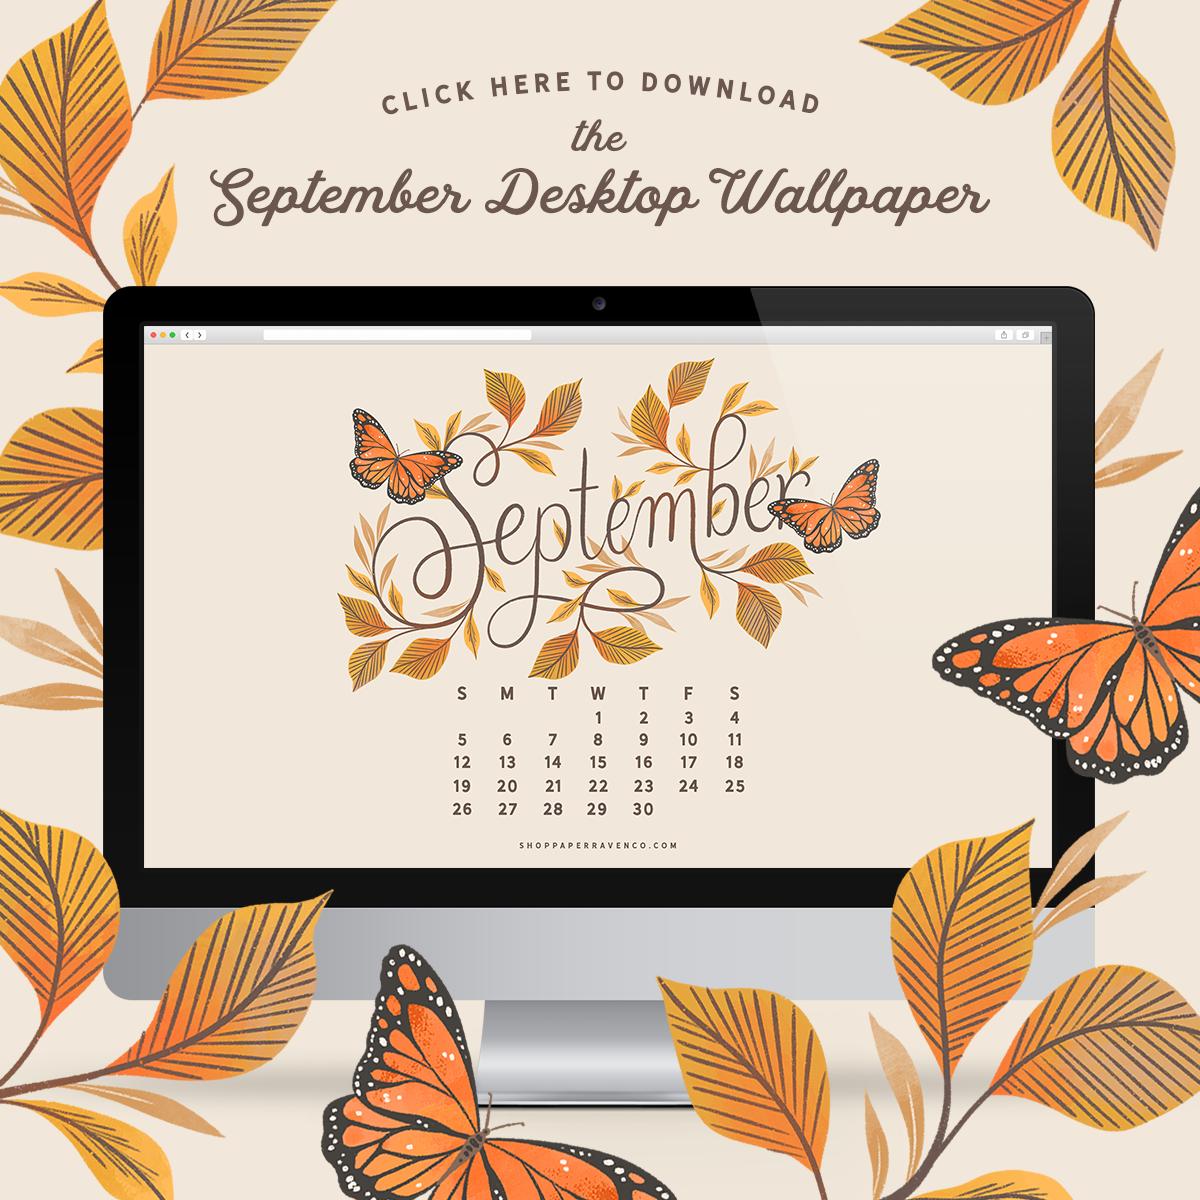 September 2021 Illustrated Desktop Wallpaper by Paper Raven Co. #dressyourtech #desktopwallpaper